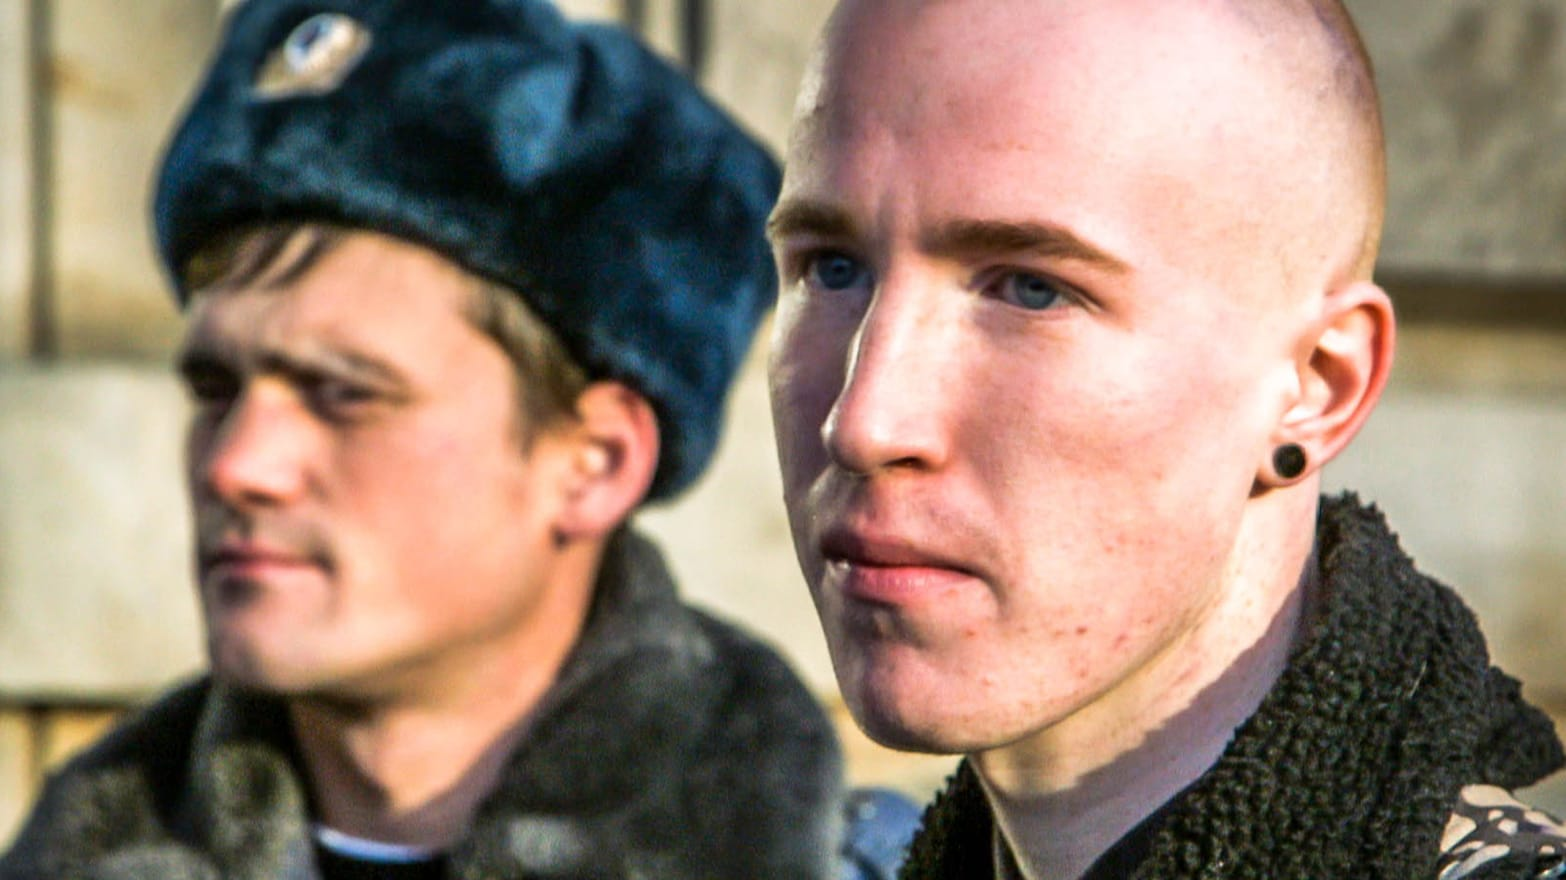 The 'Hunted' Gays of Putin's Russia: Vicious Vigilantes and